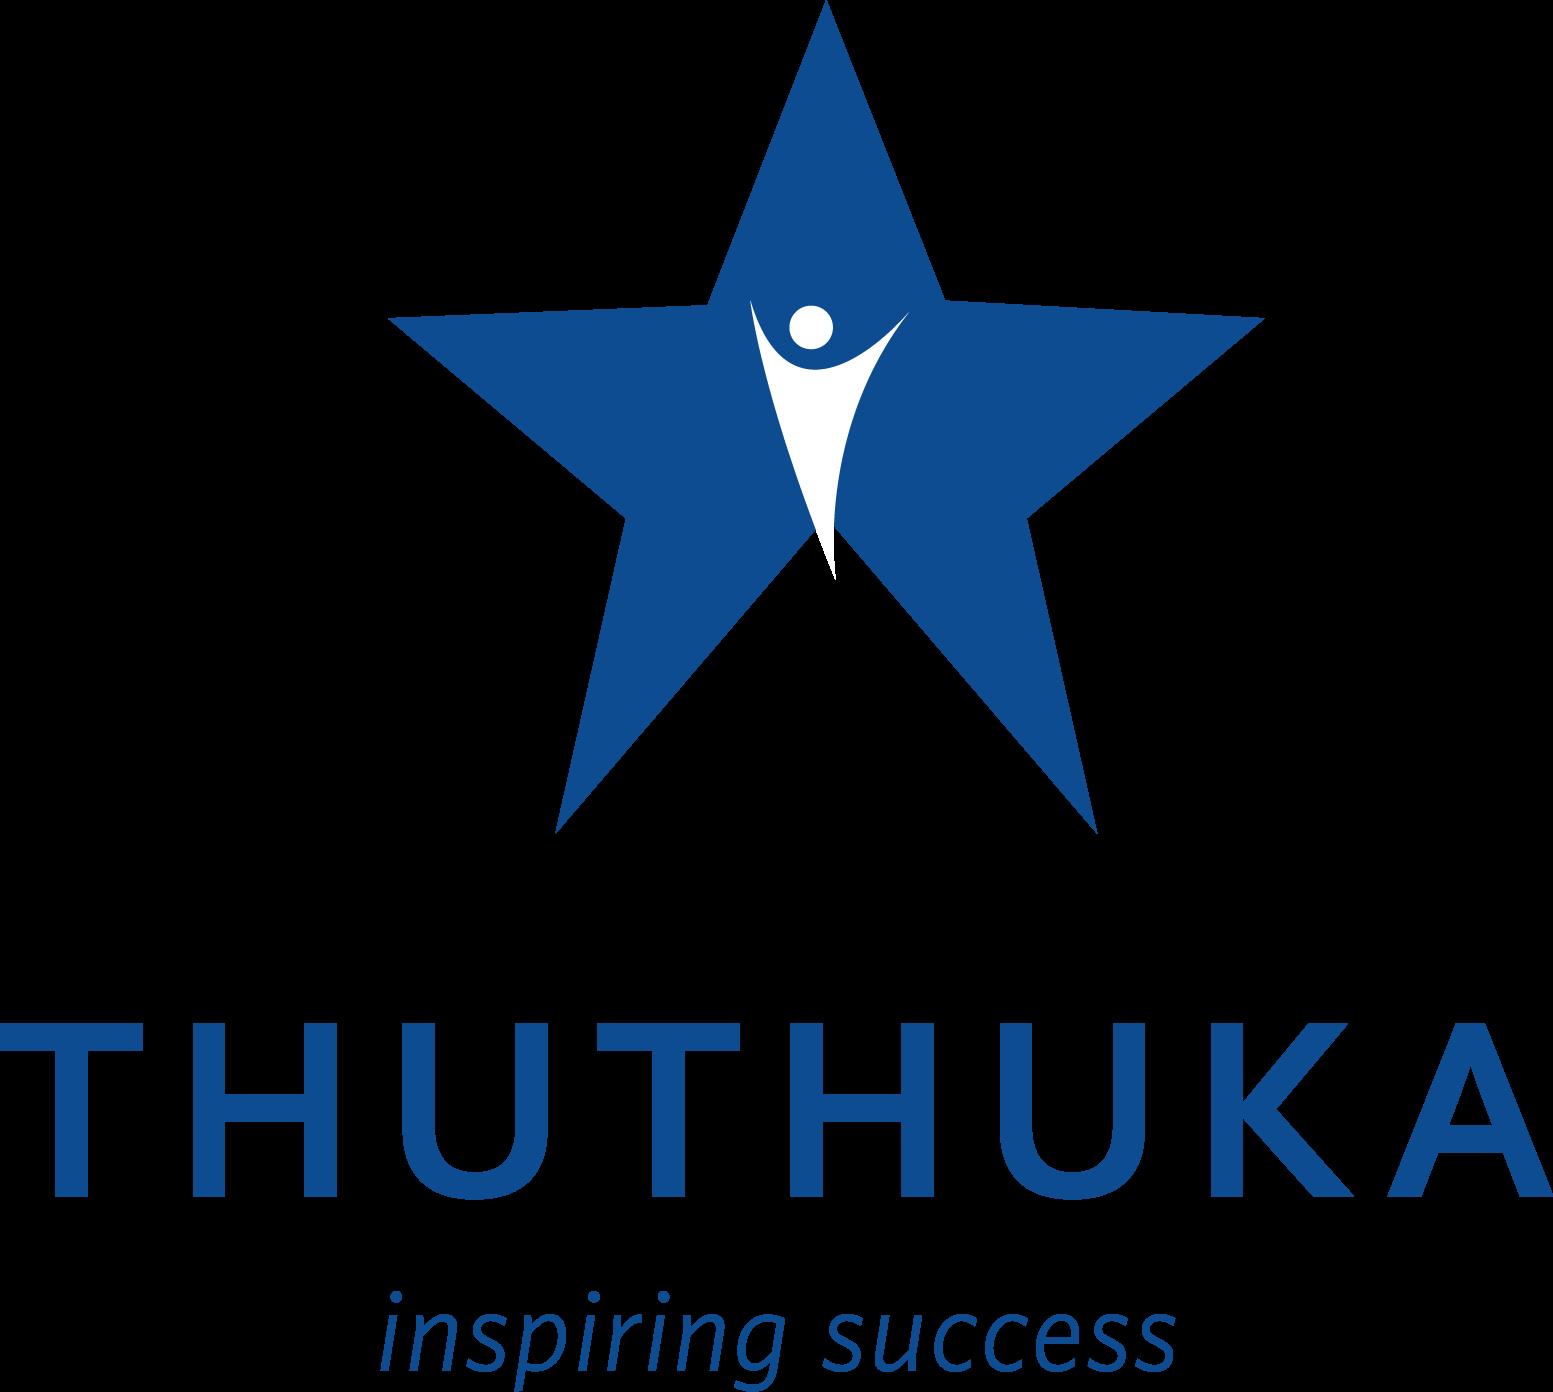 Thuthuka